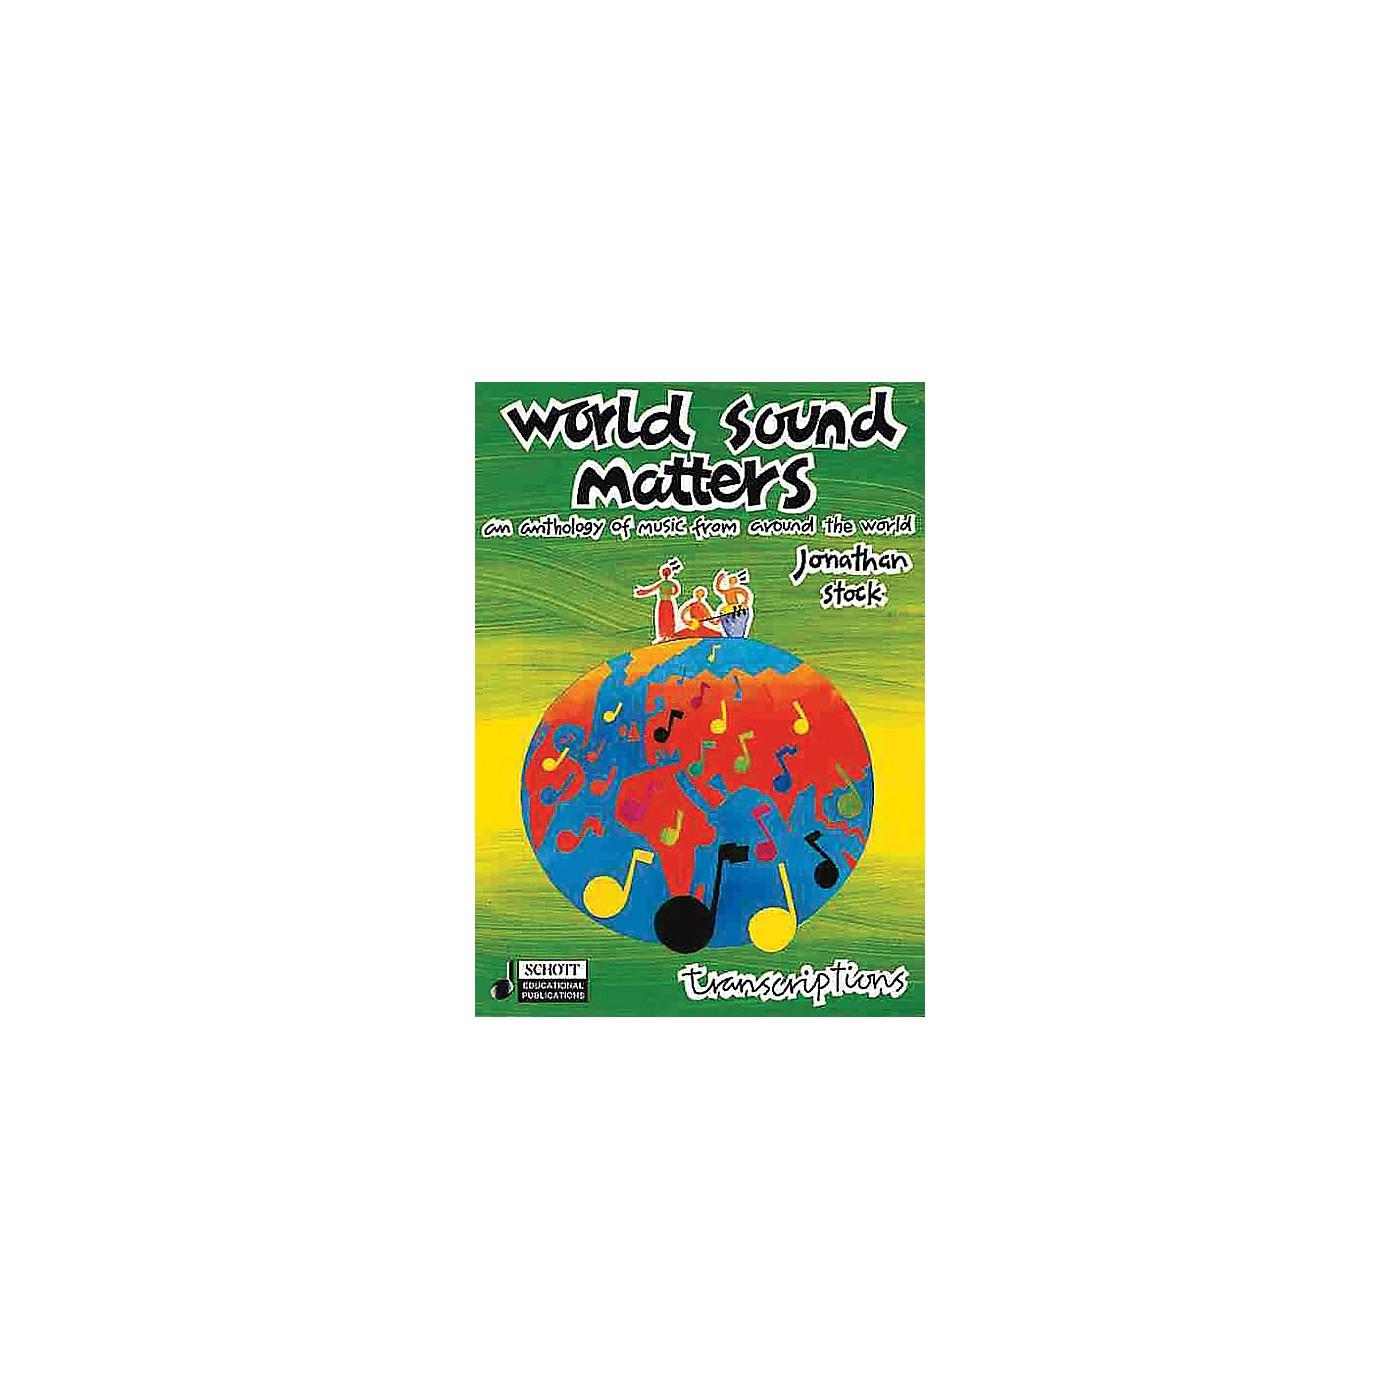 Schott World Sound Matters - An Anthology of Music from Around the World Schott Series CD by Jonathan Stock thumbnail